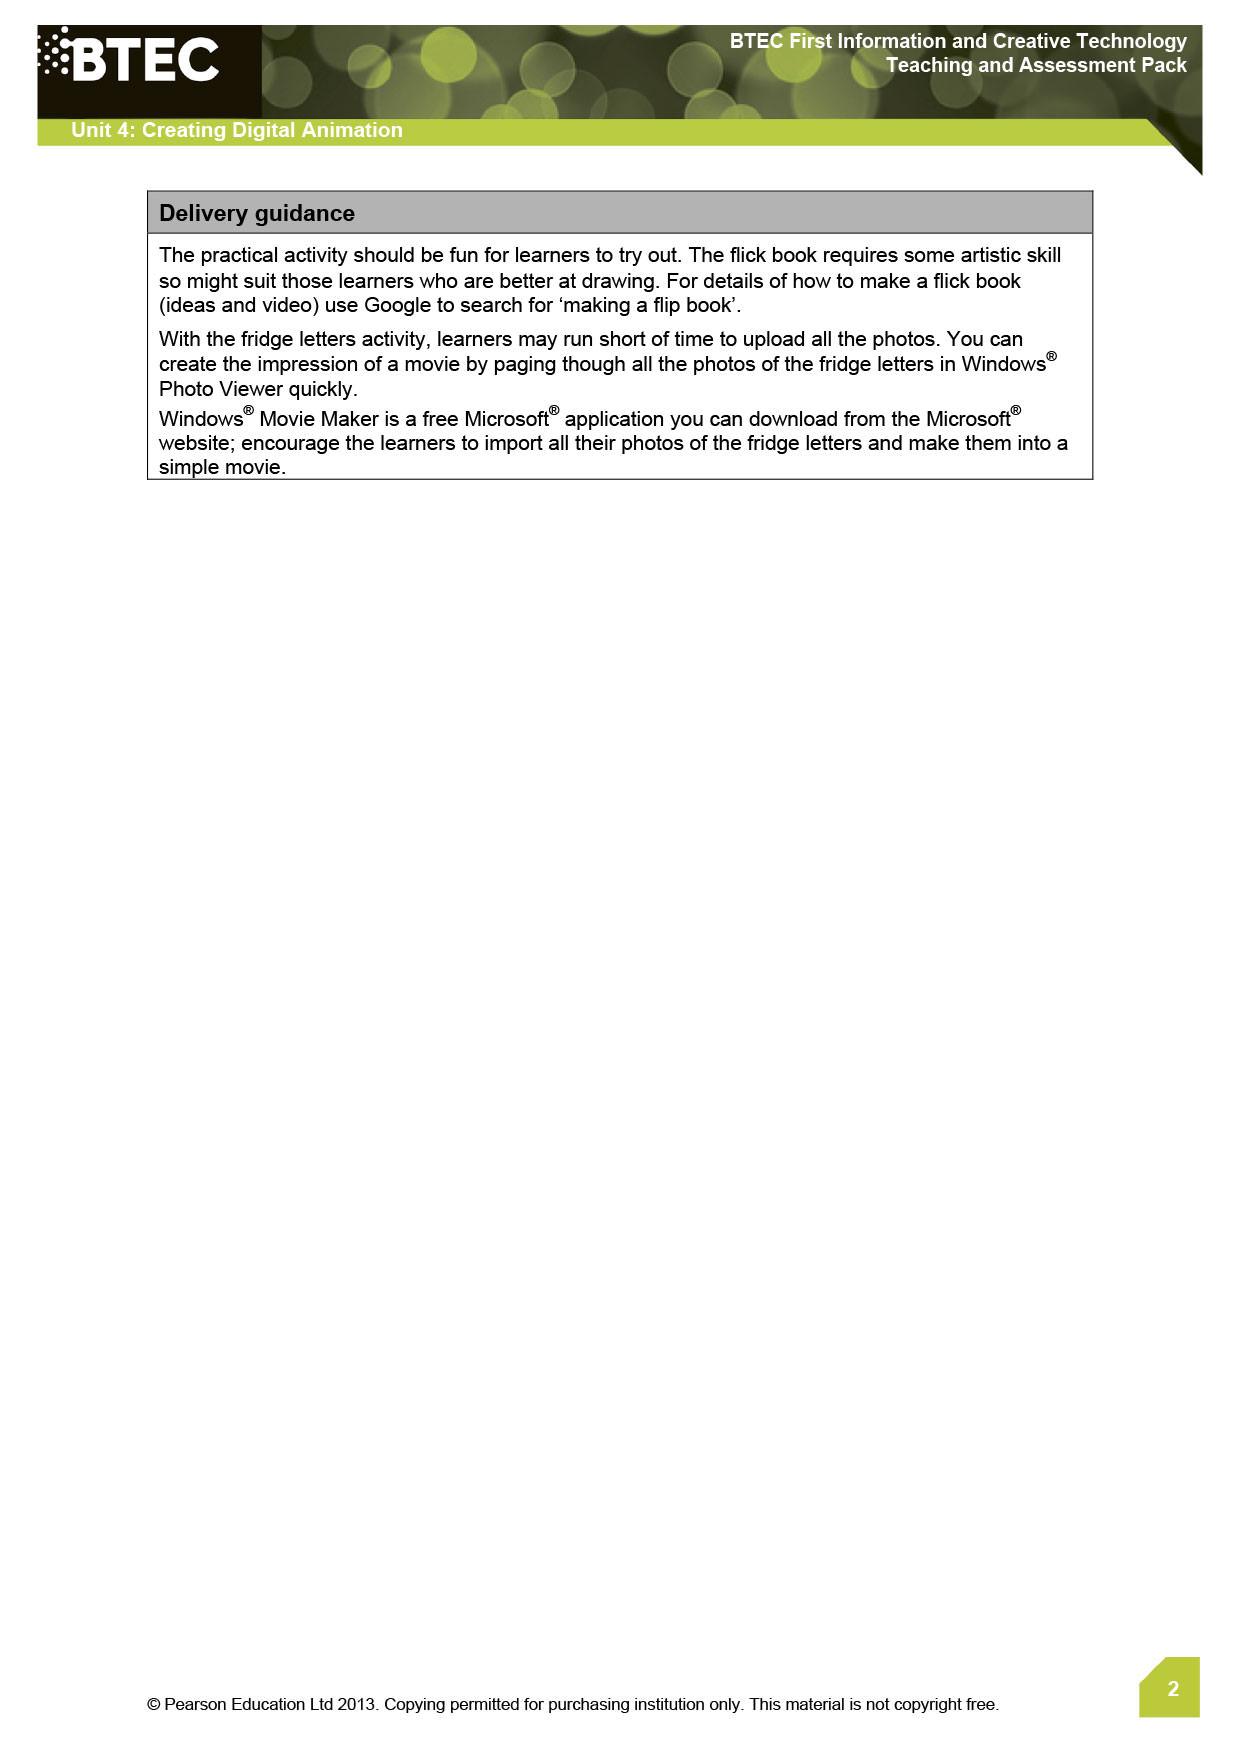 Fun run certificate template choice image templates example free fun run certificate template gallery templates example free download dance gift certificate design korzet free employment xflitez Gallery